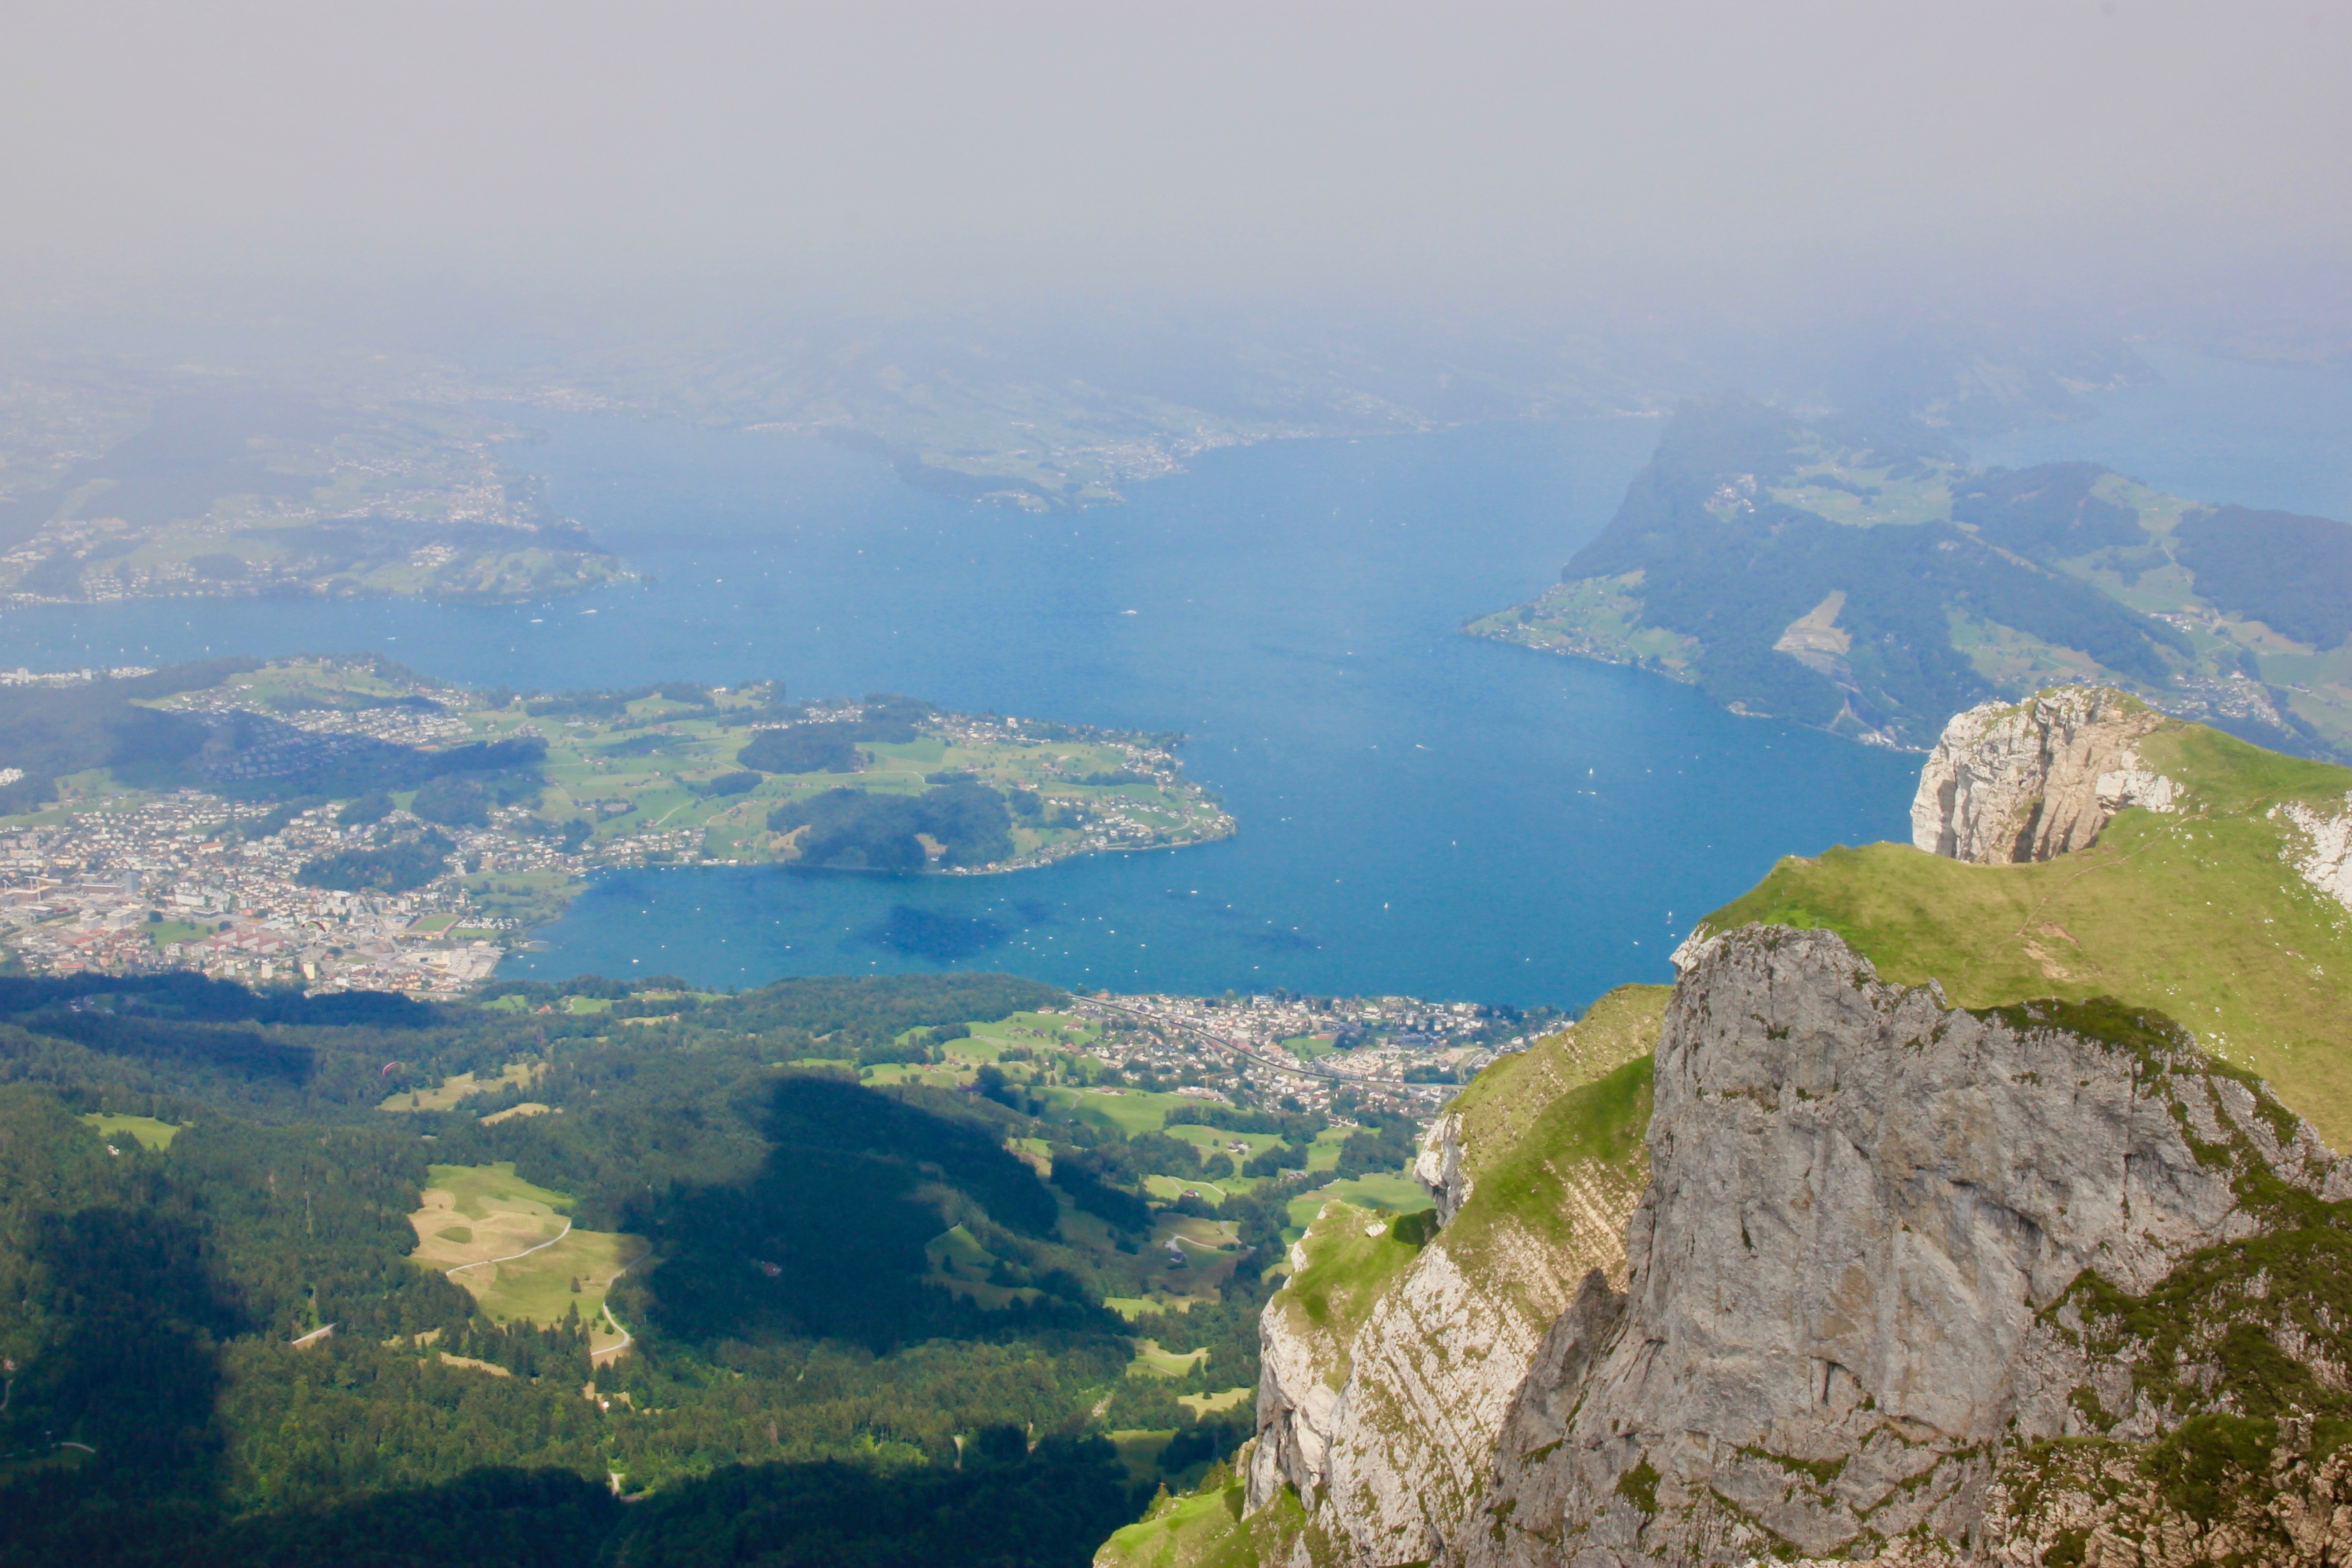 Monte Pilatus - Anello d'oro